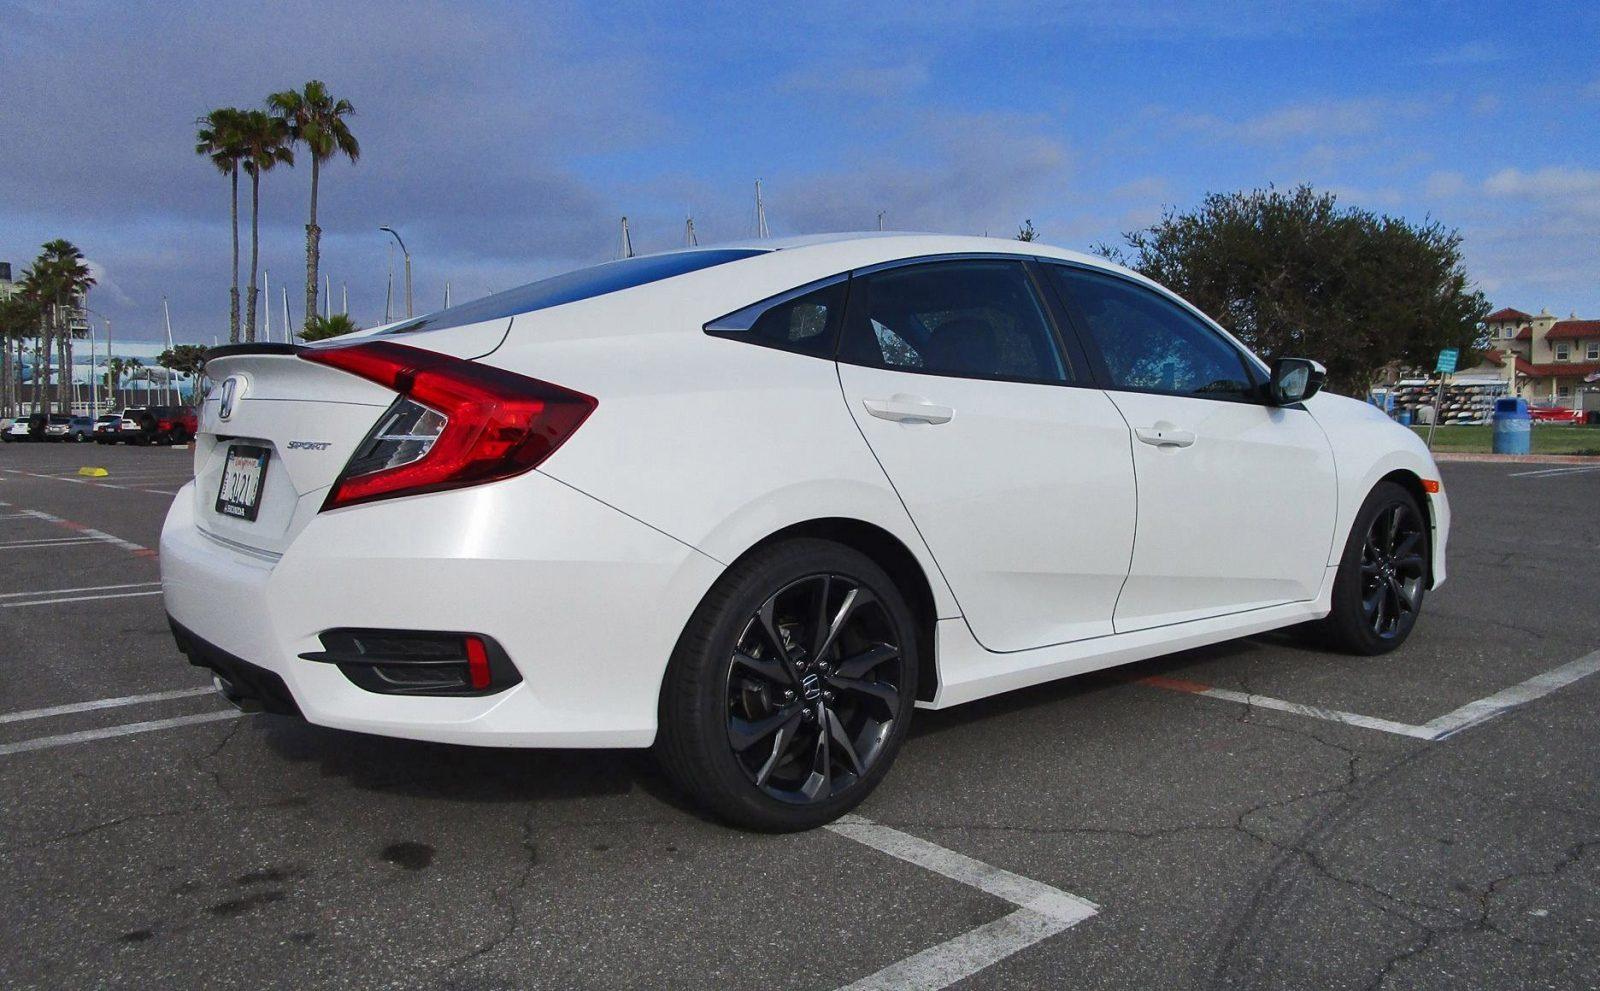 2019 Honda Civic Sport 2 0l 4 Door Manual Review By Ben Lewis Road Test Reviews Car Revs Daily Com